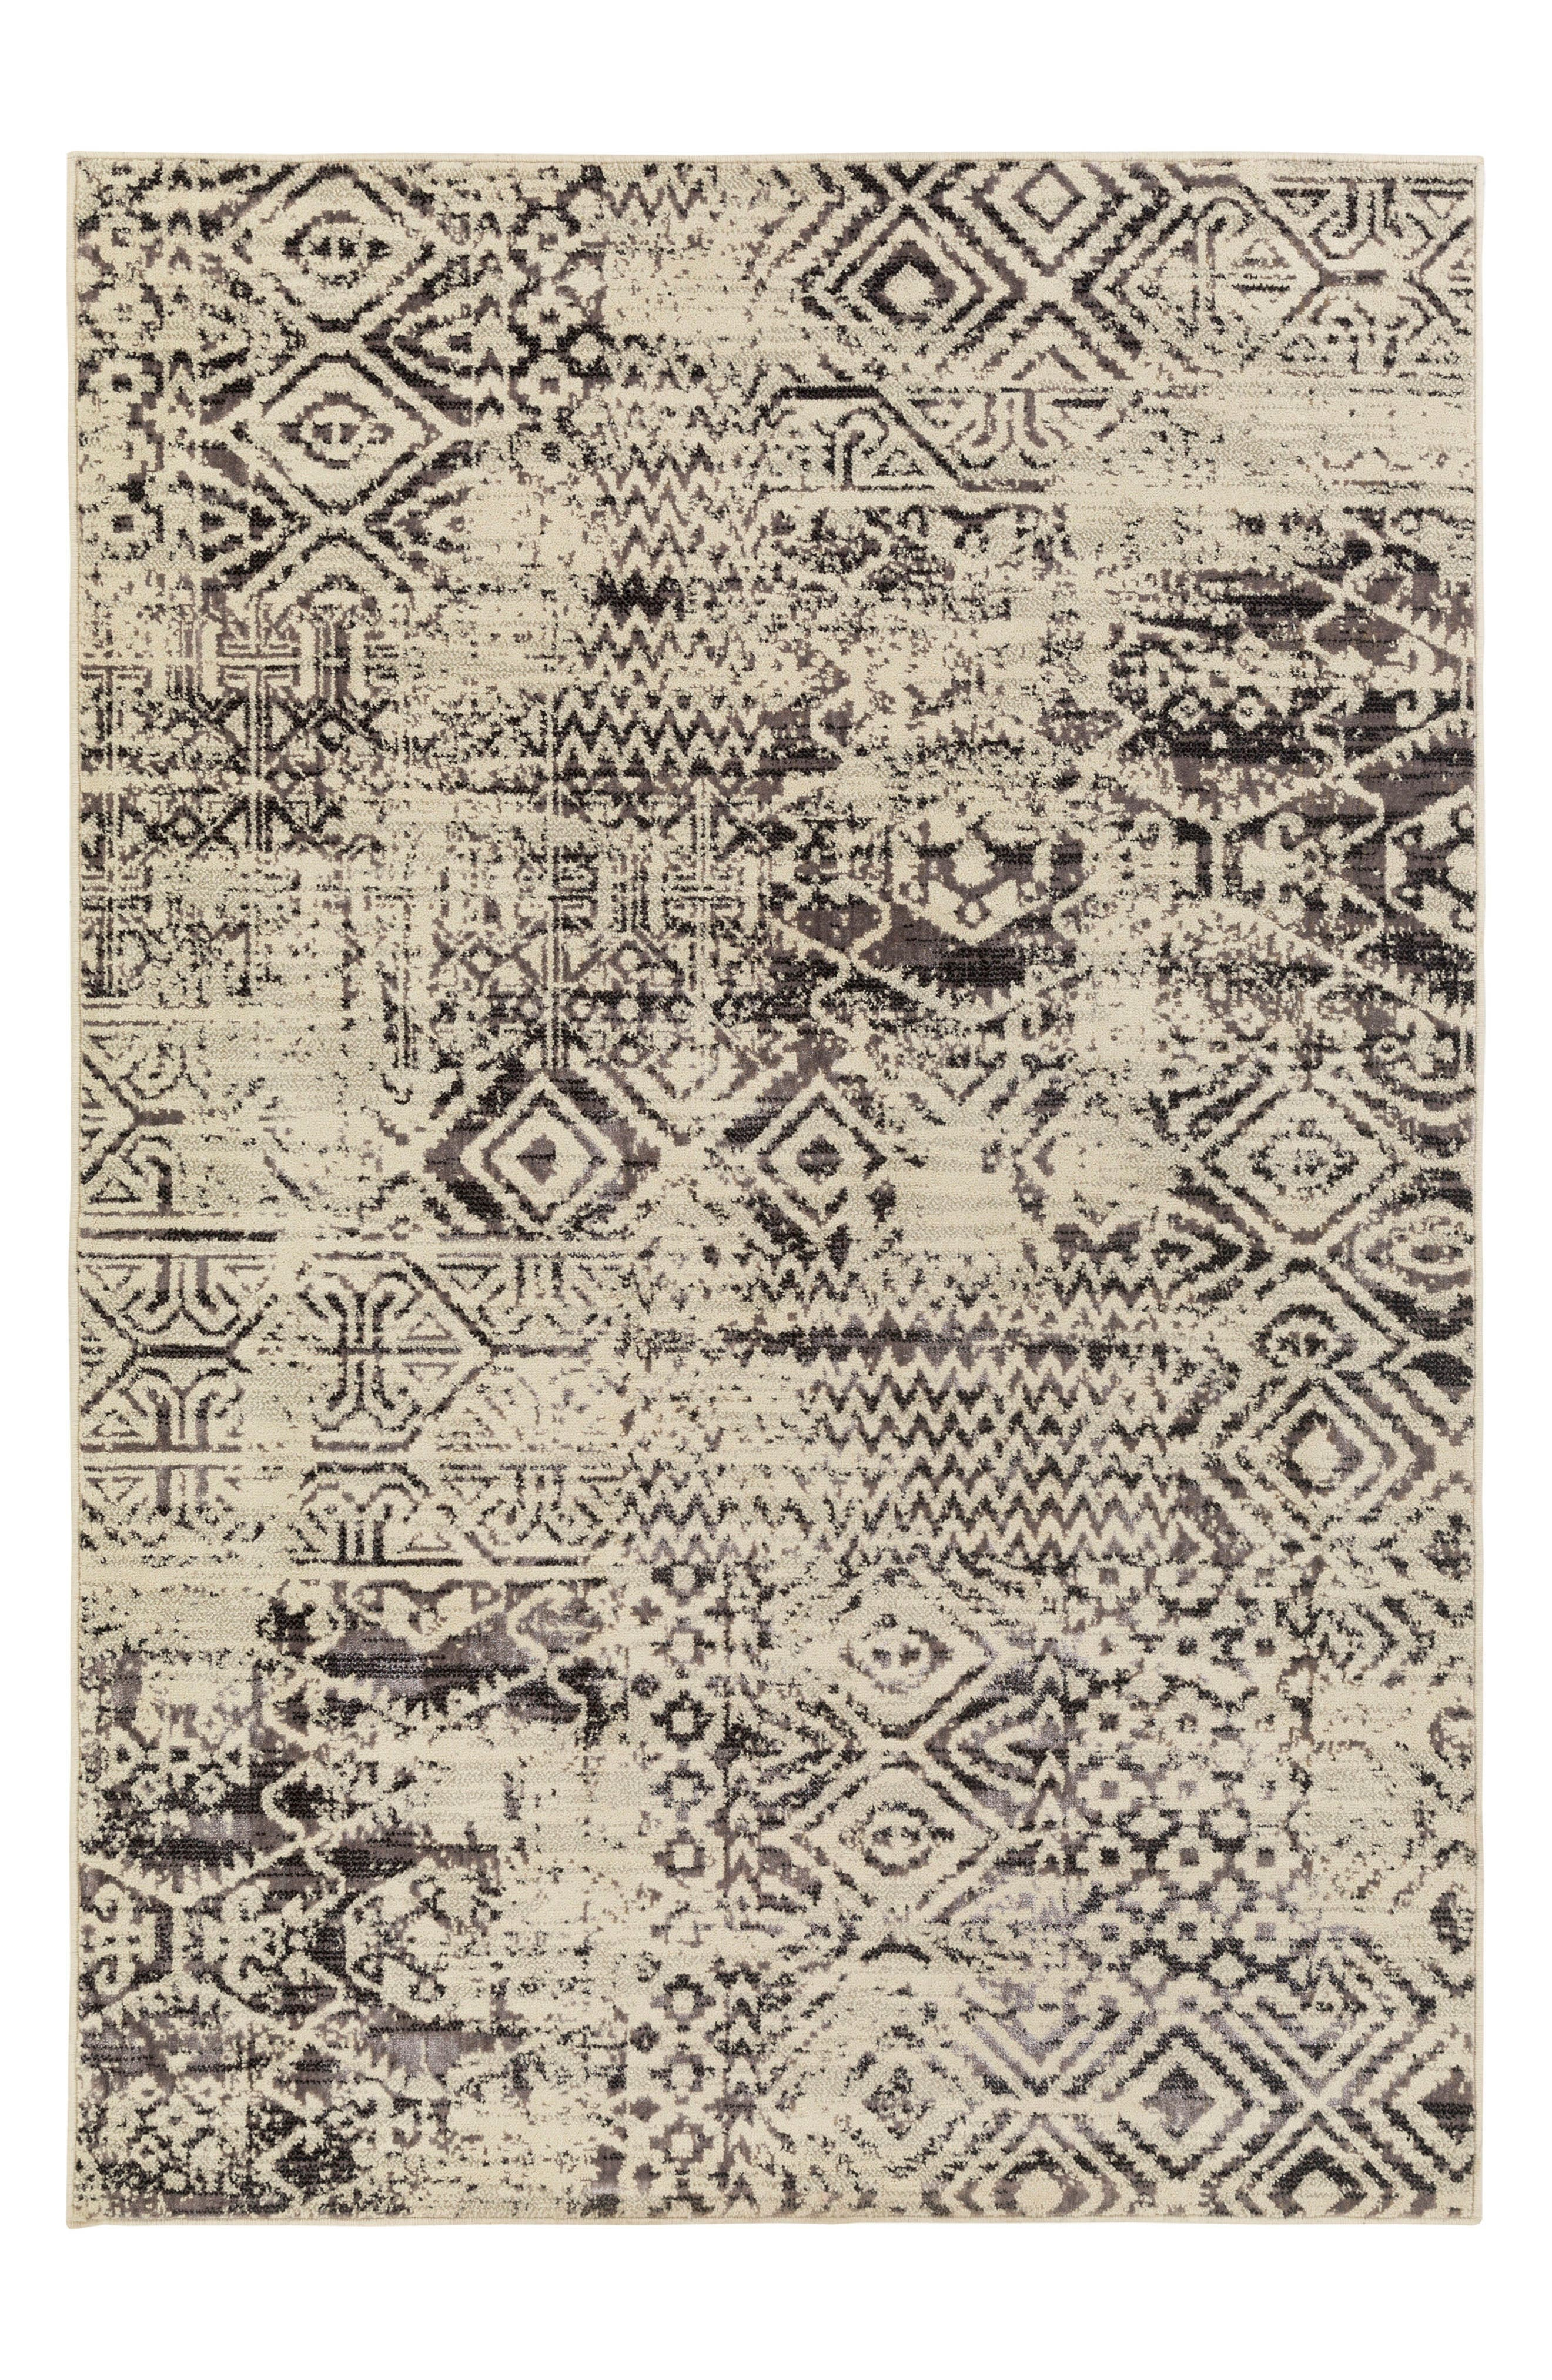 Stretto Global Maze Rug,                         Main,                         color, 250